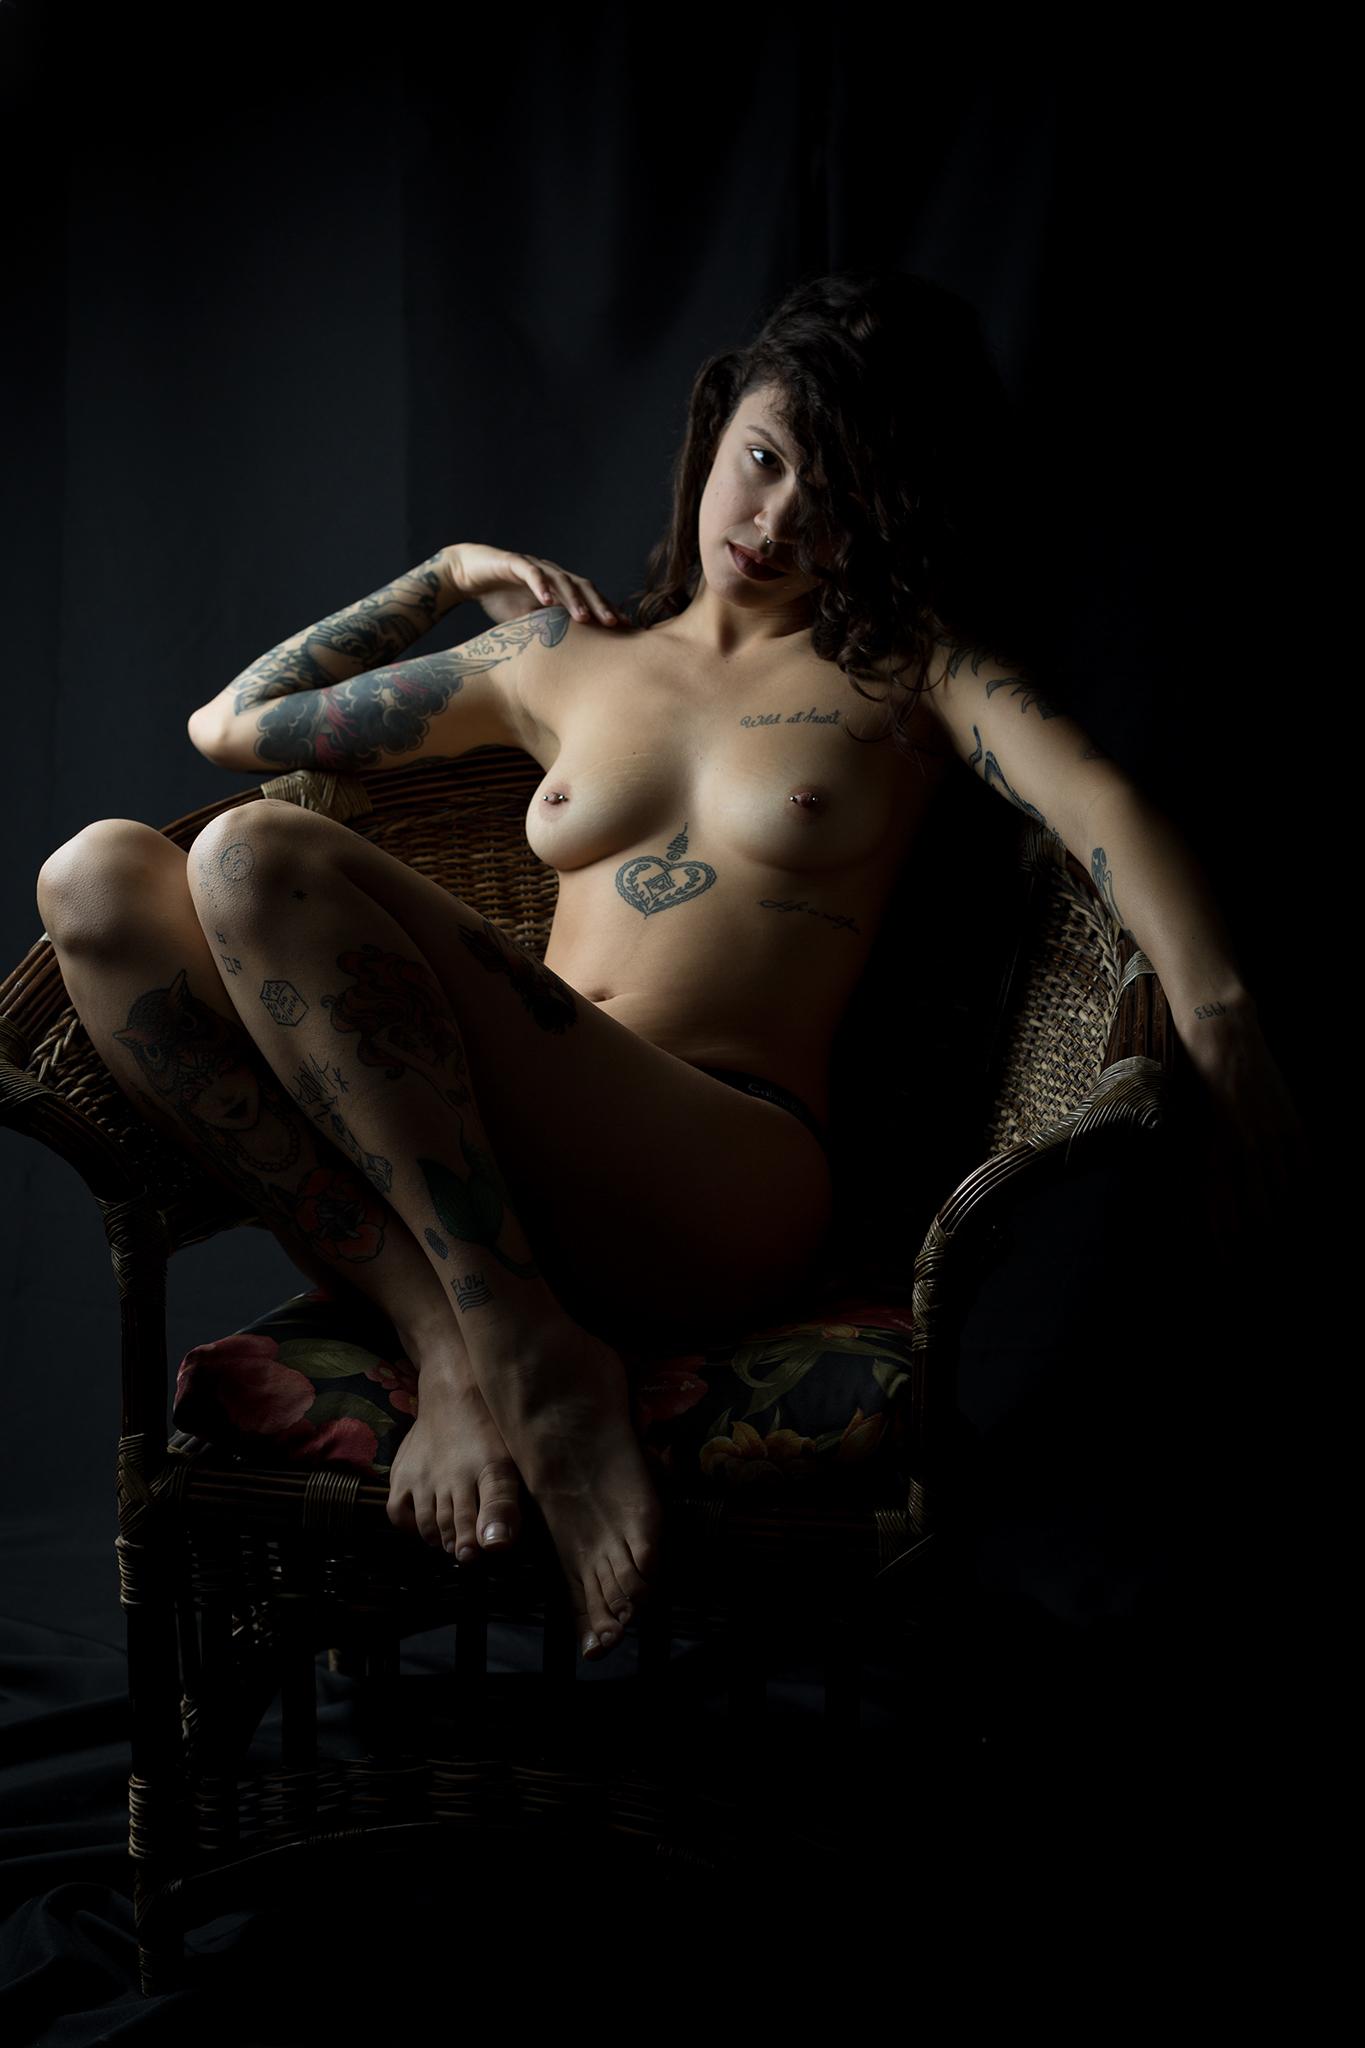 В кресле или на кровати? / фото Iran Monte